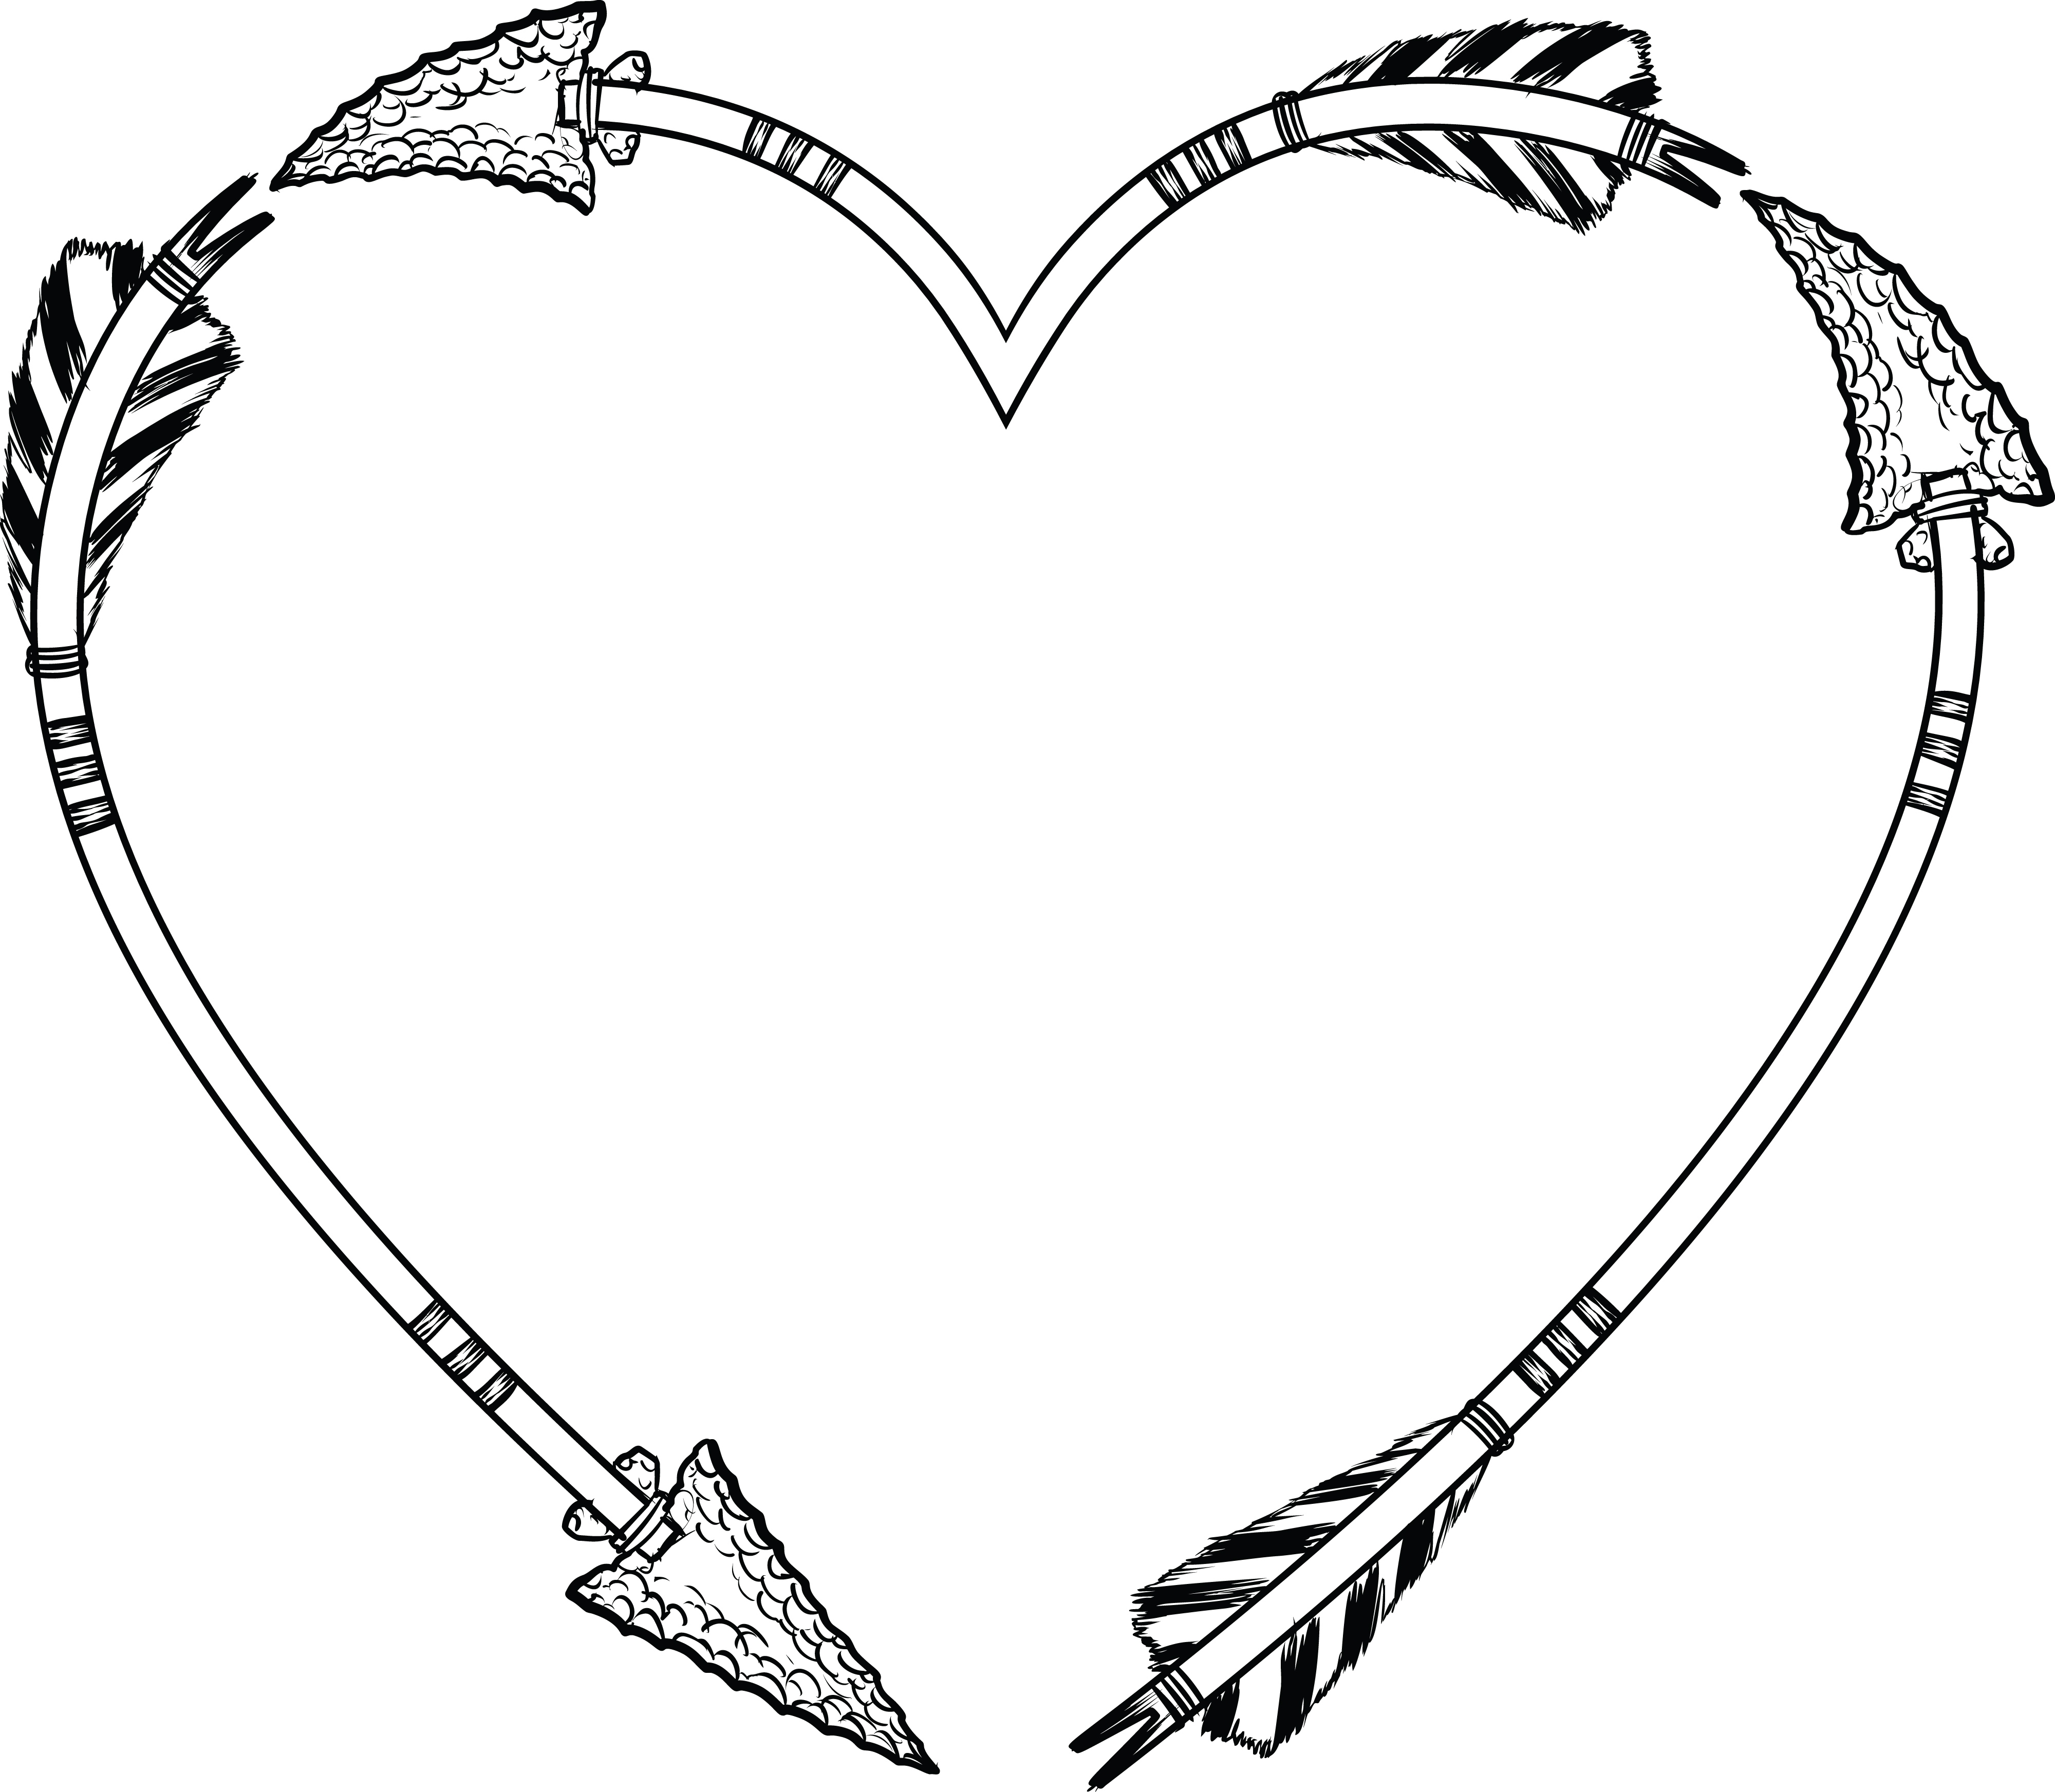 Free Clipart of a flint arrow heart shaped frame